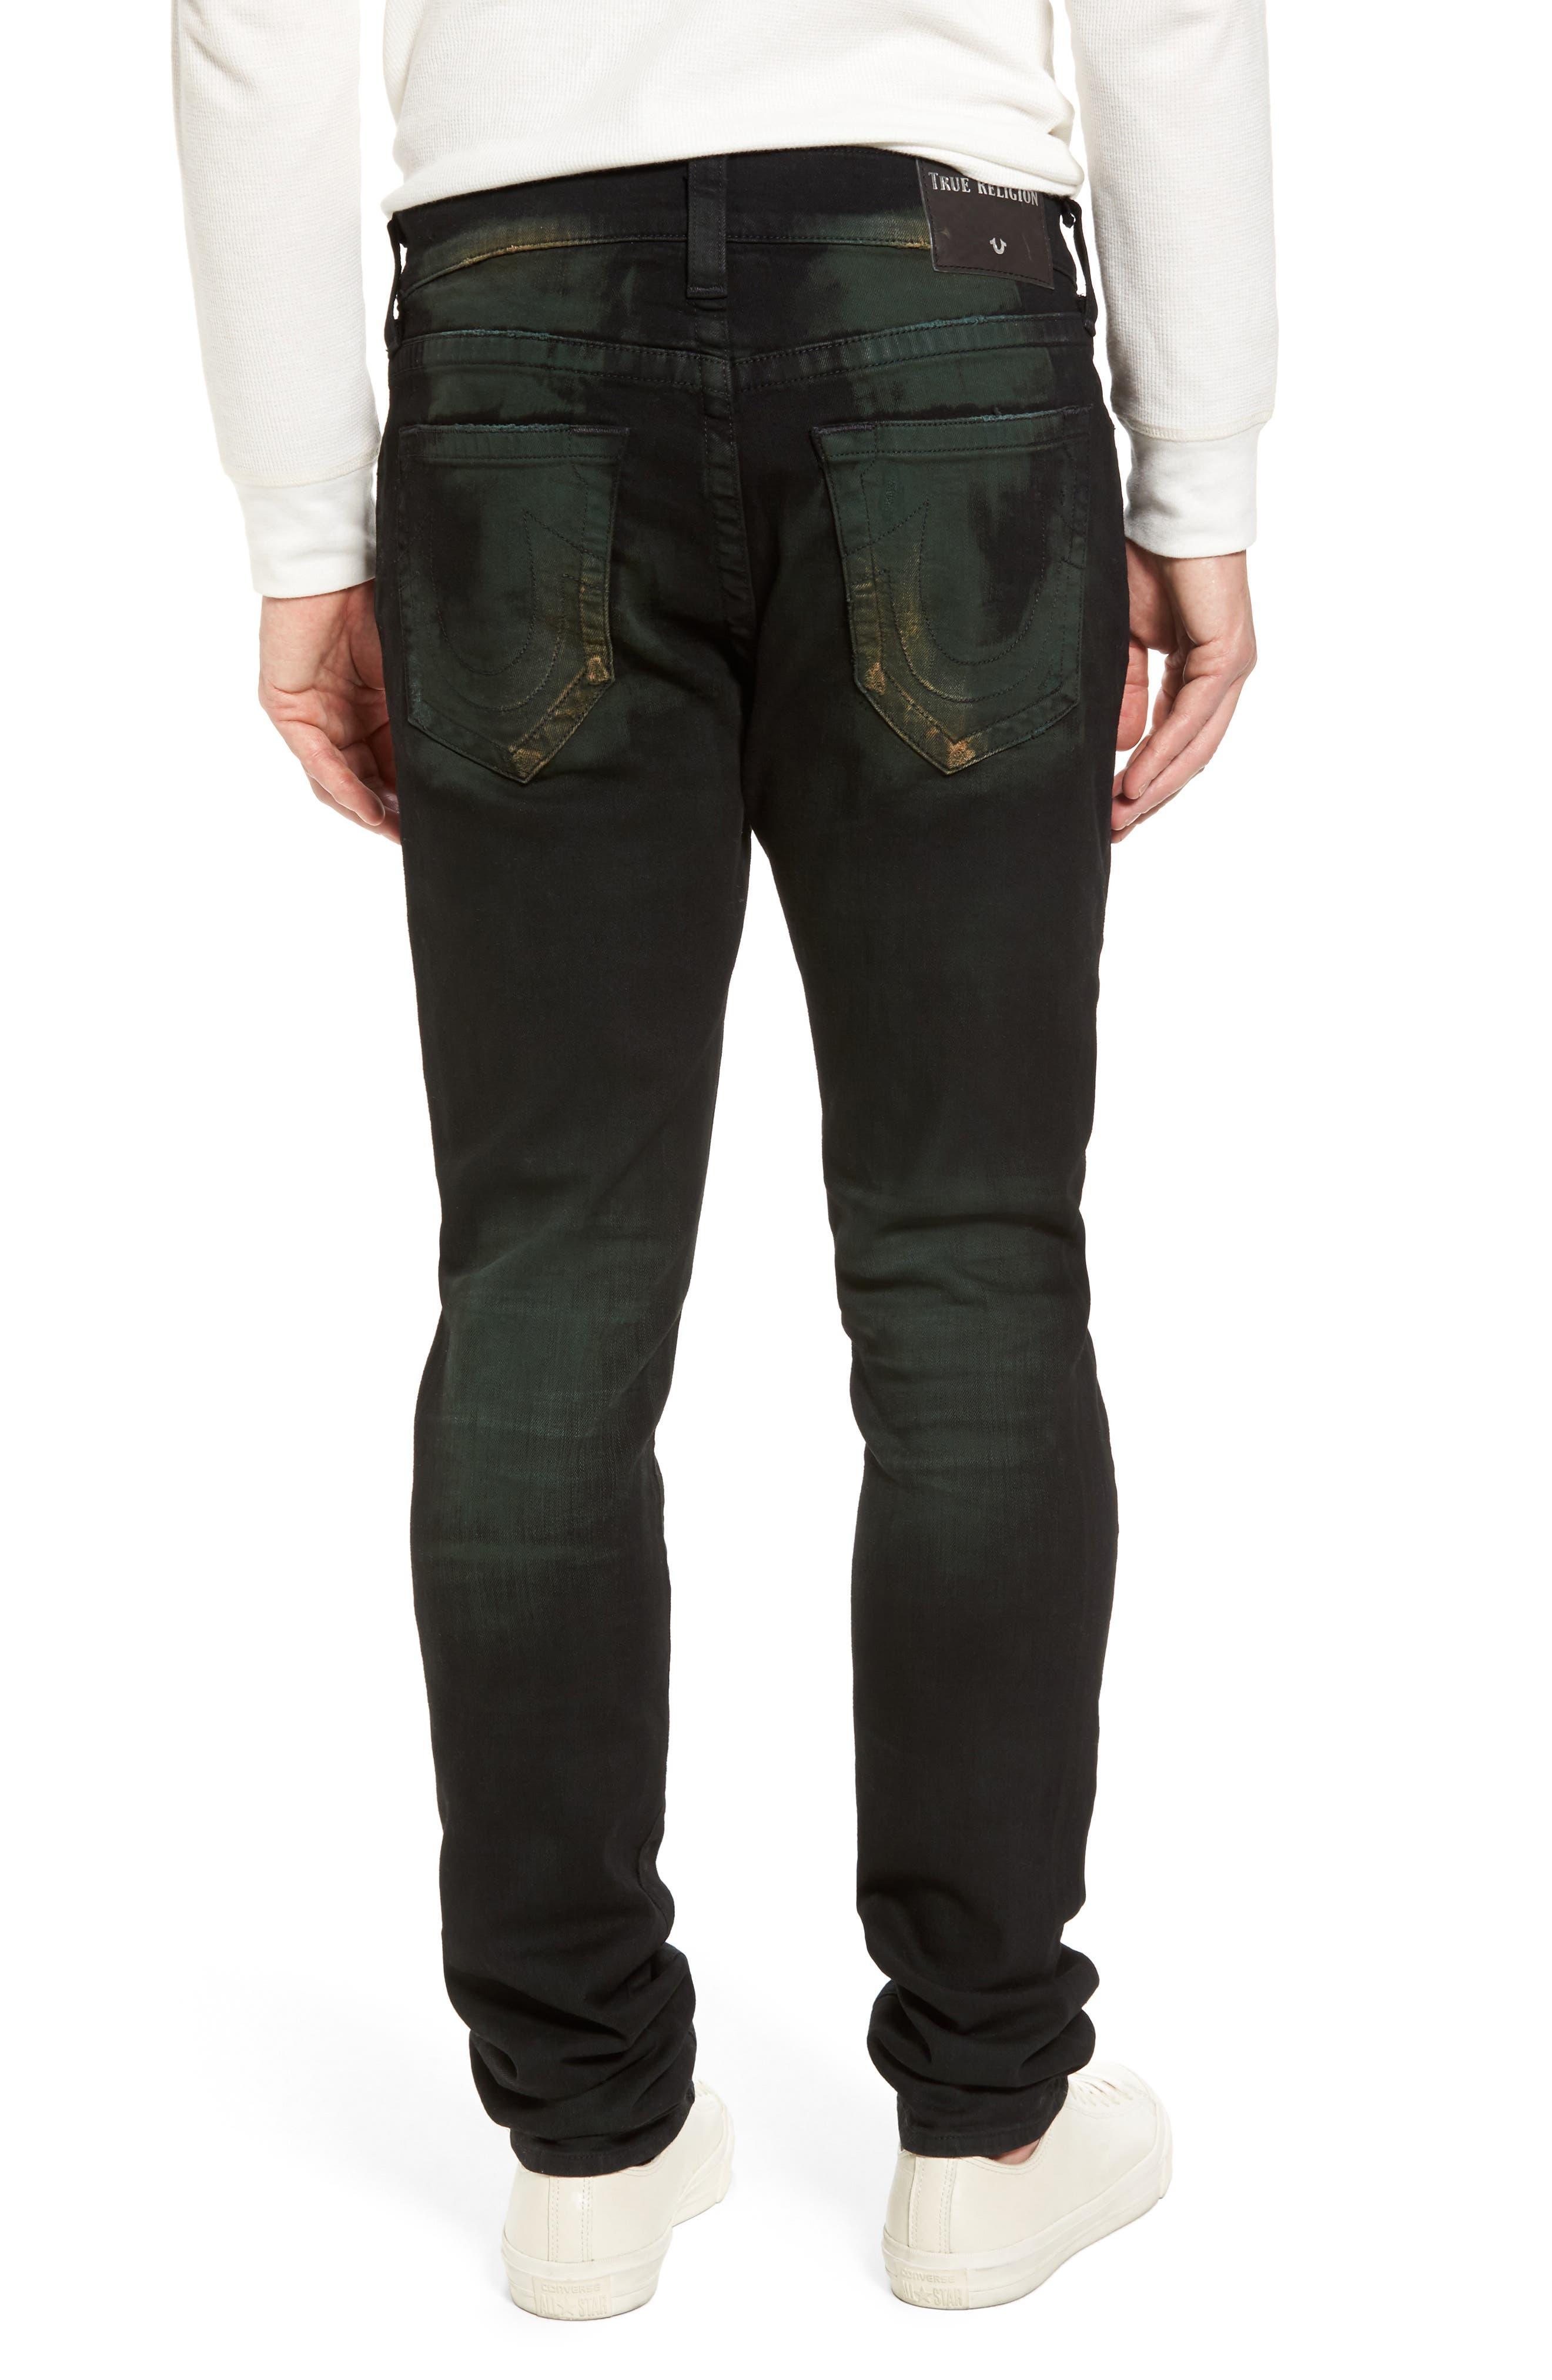 Alternate Image 2  - True Religion Brand Jeans Rocco Skinny Fit Jeans (Green Blaze)